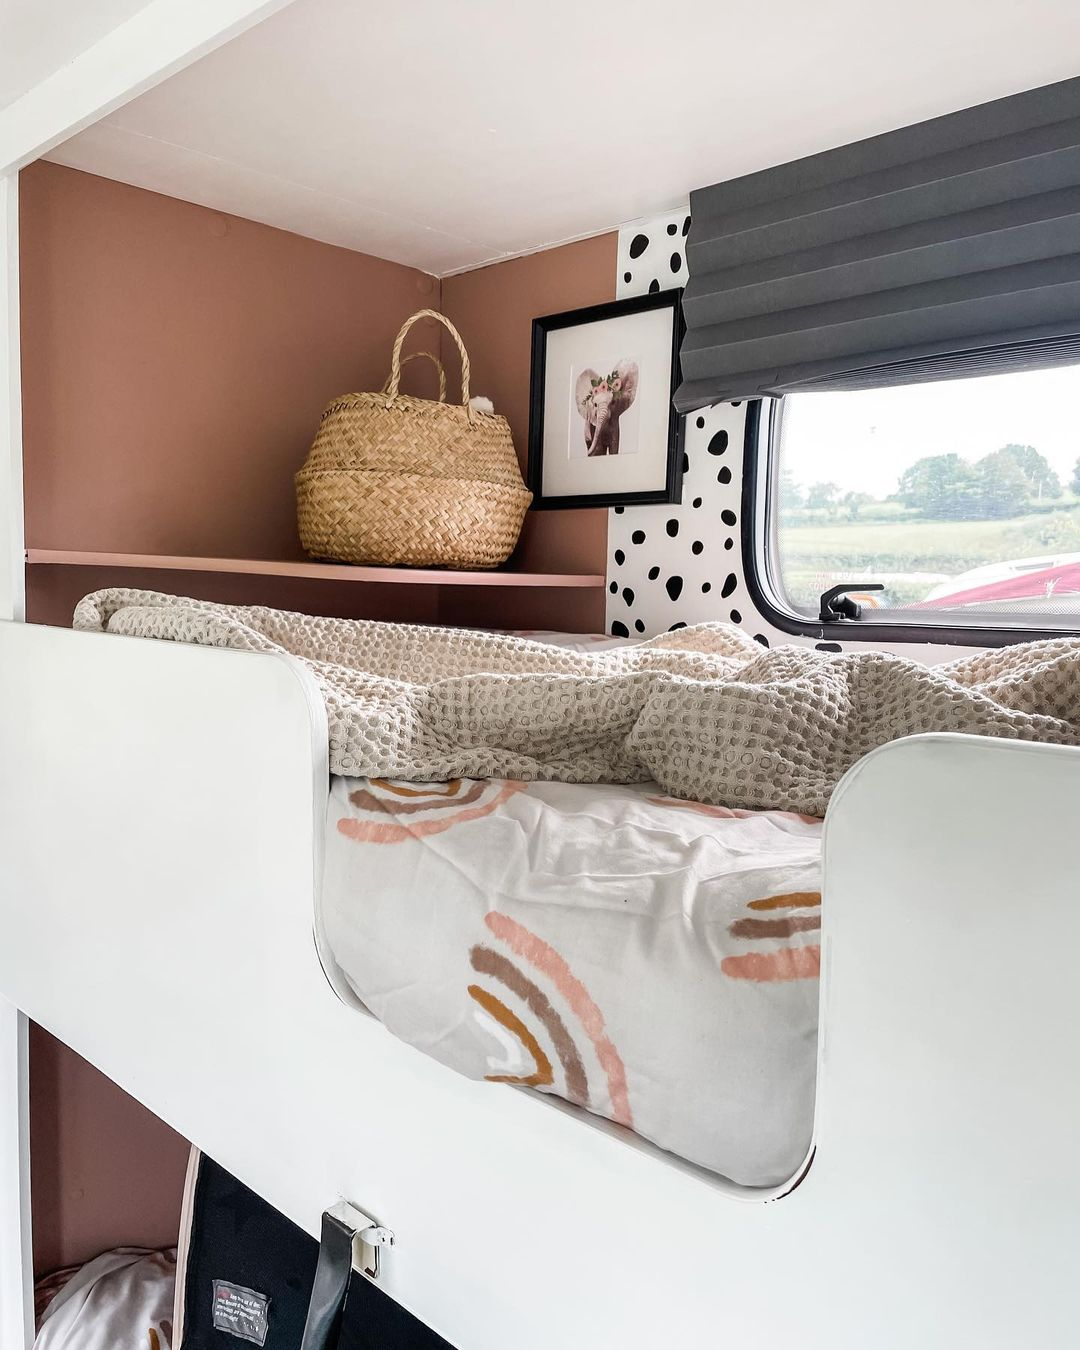 Double bunks inside a renovated caravan.